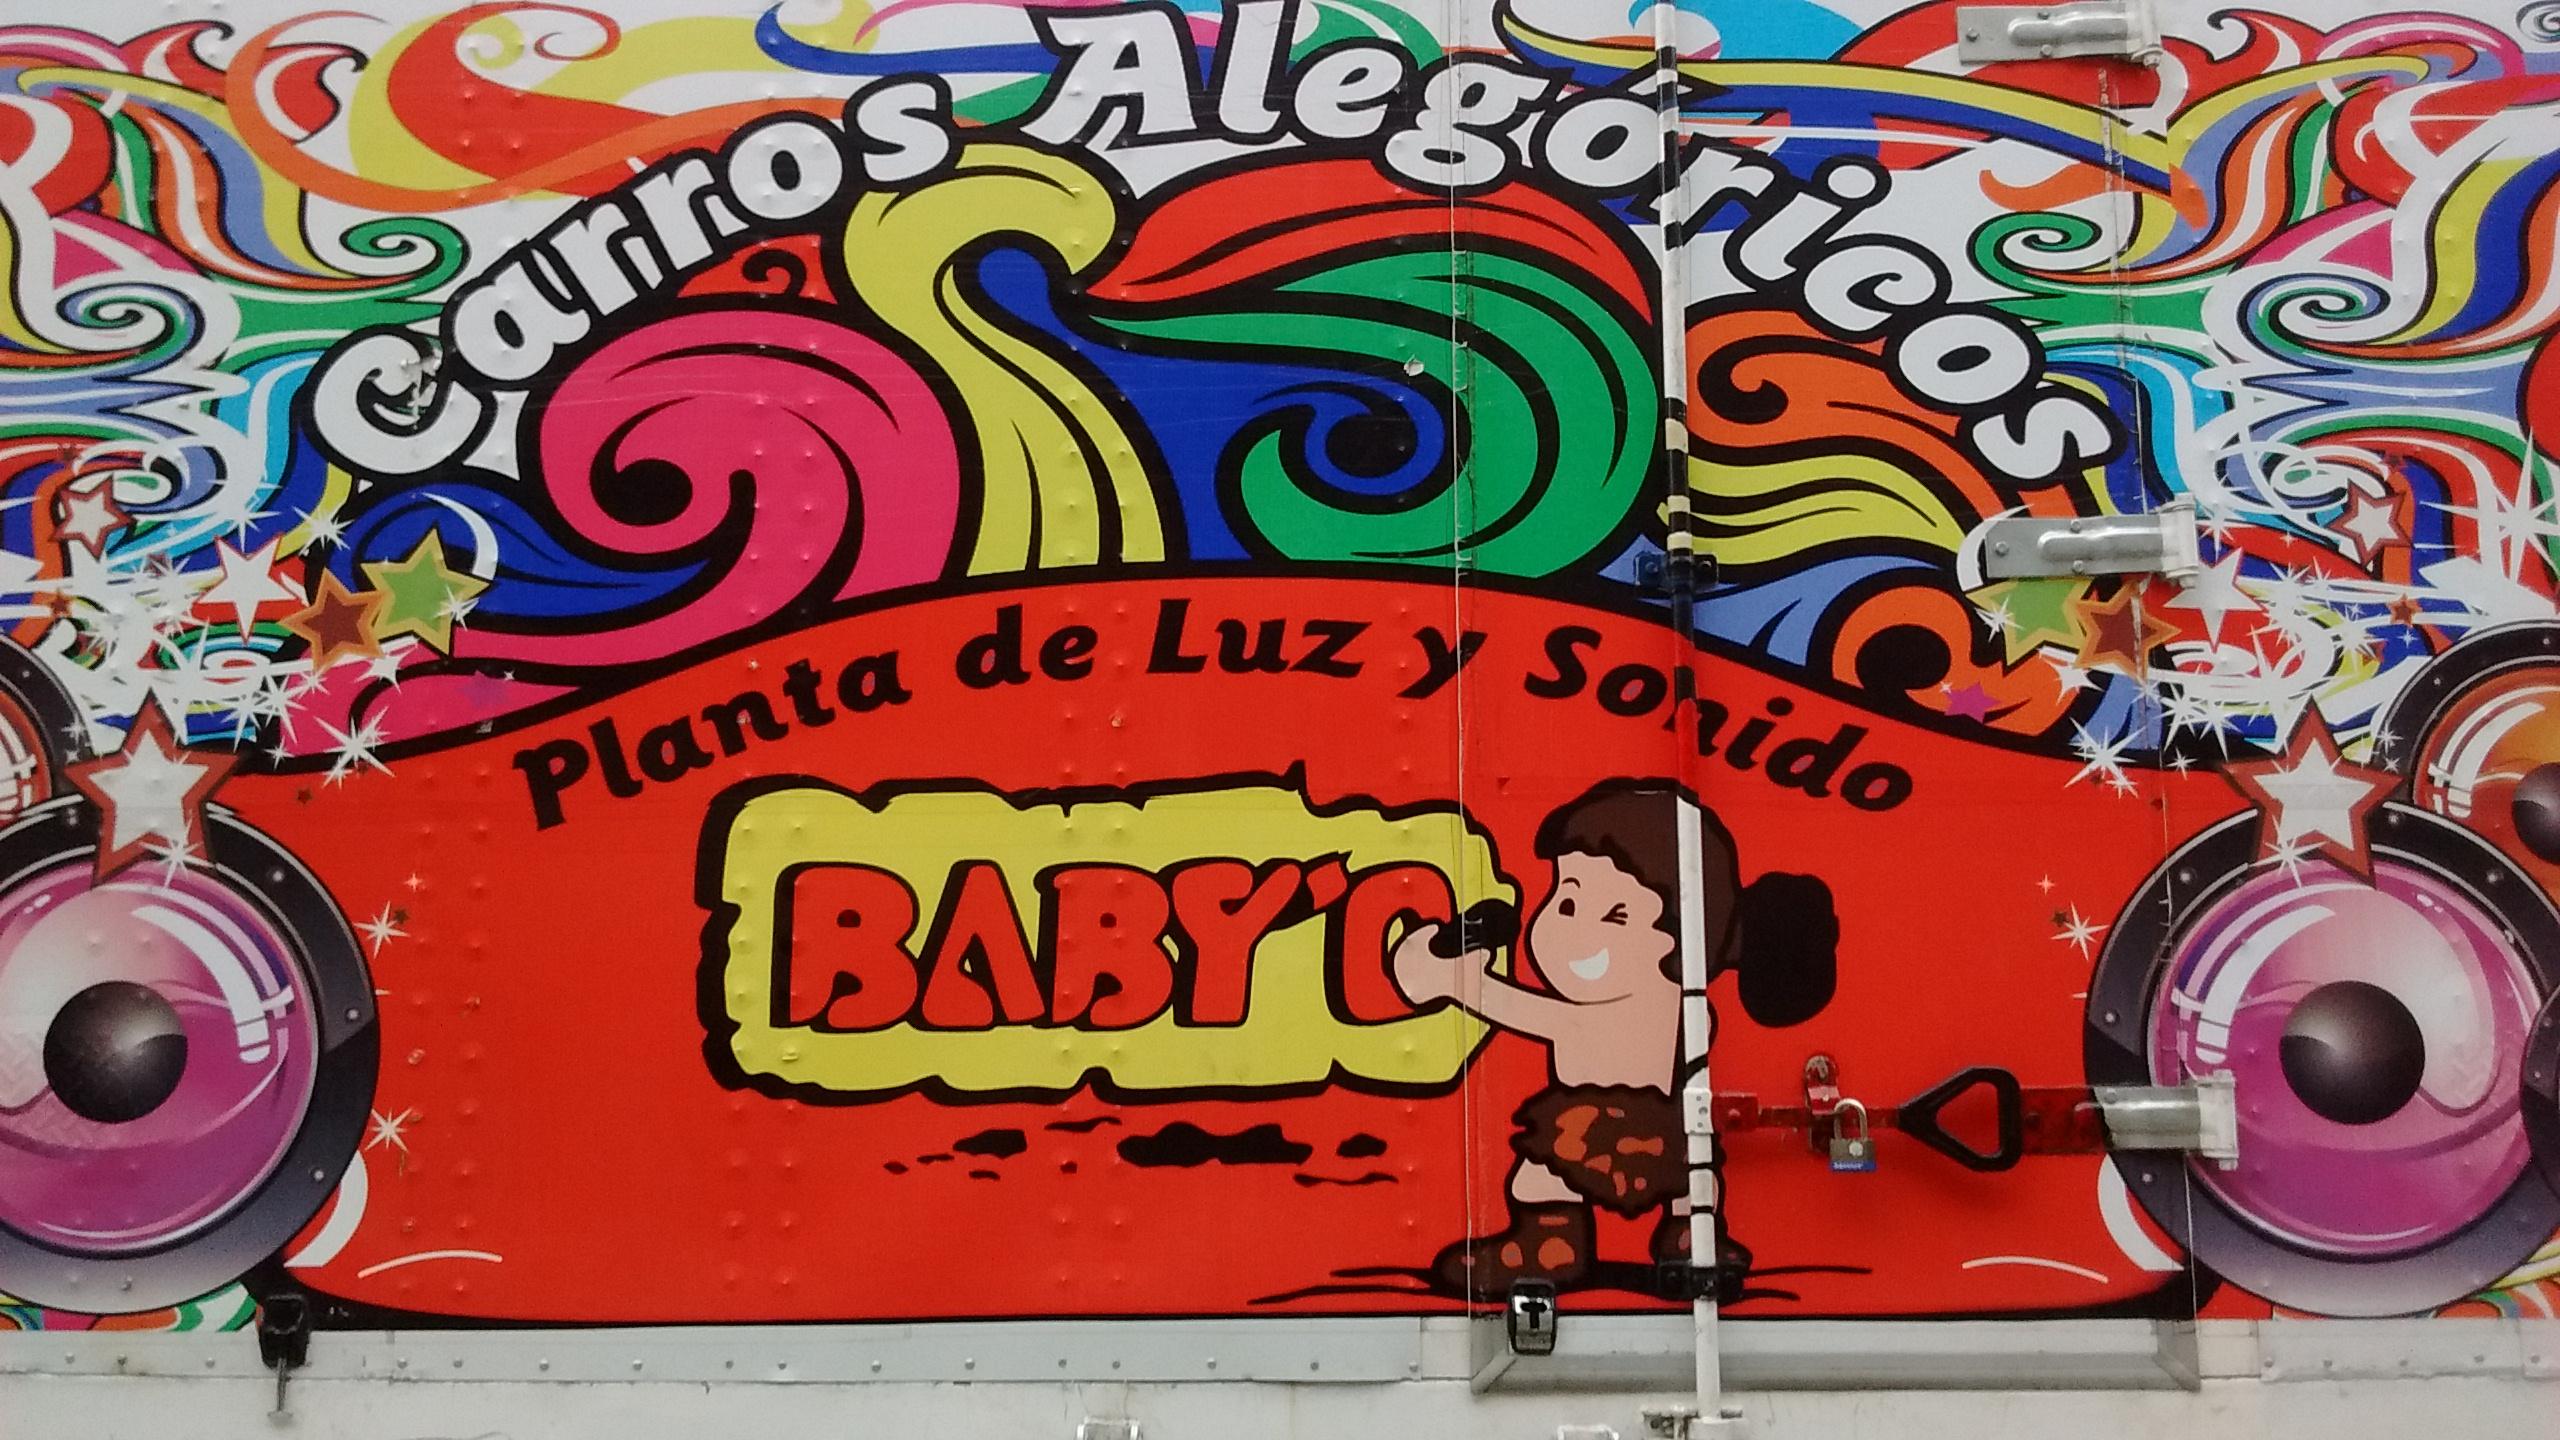 Veracruz_Carros